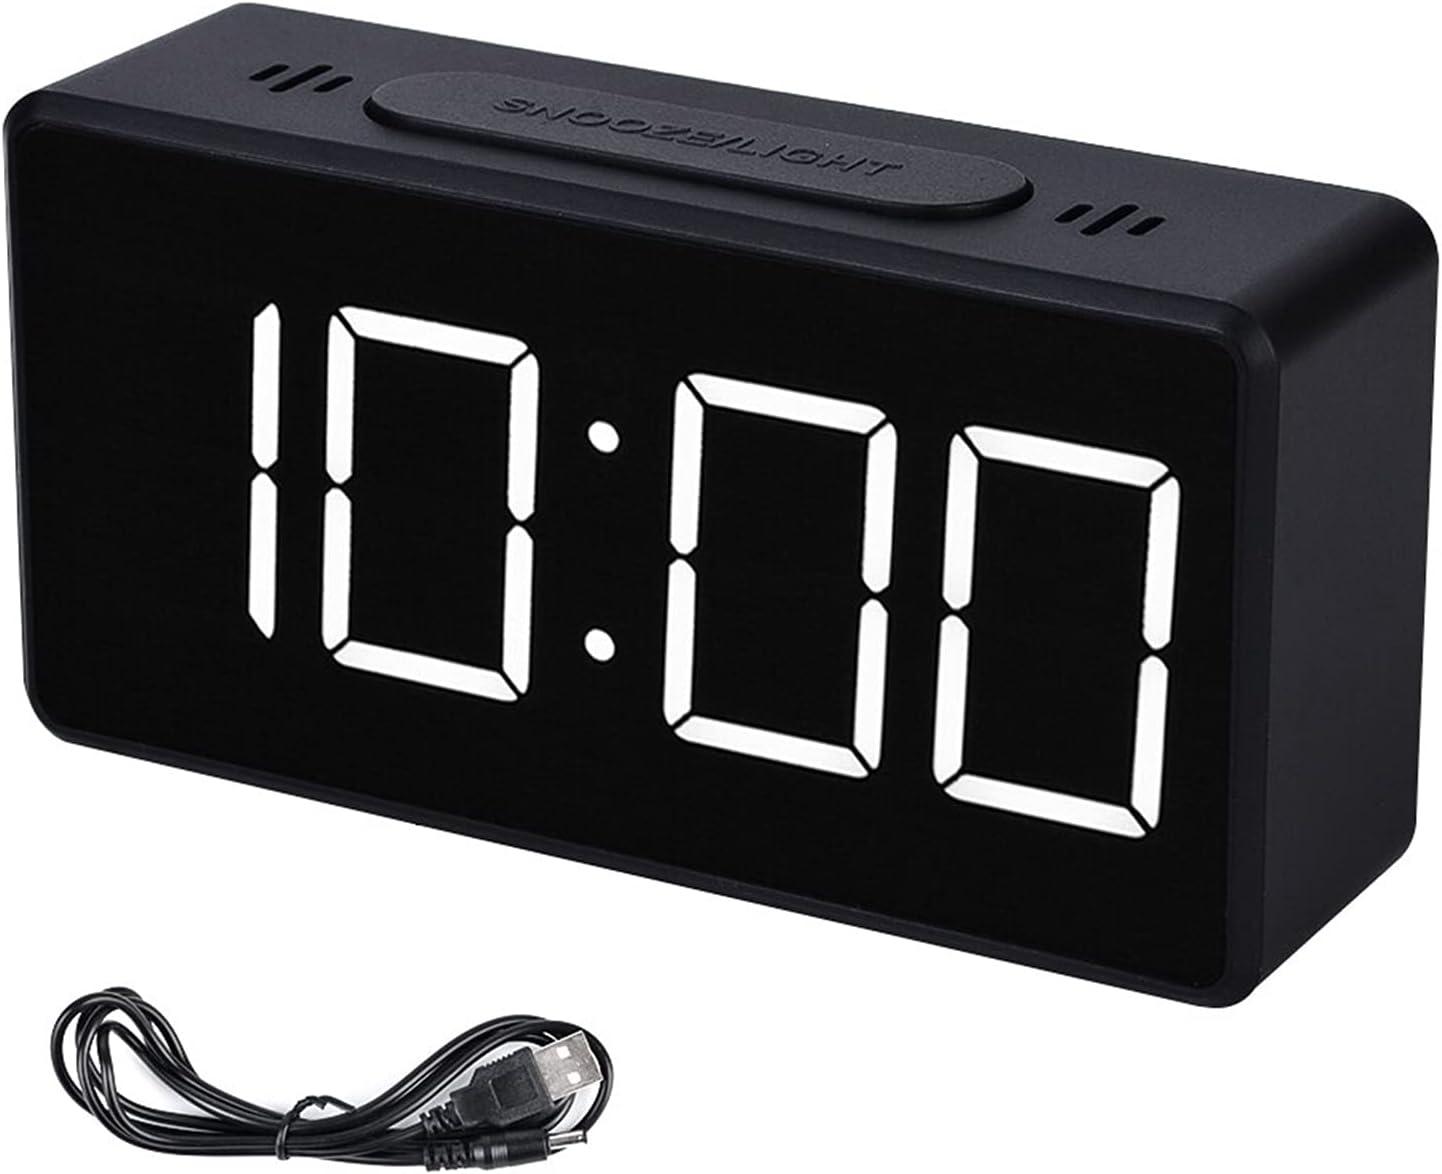 High order WBHUBIN Alarm Clock Popular standard LED Display Electron Digital